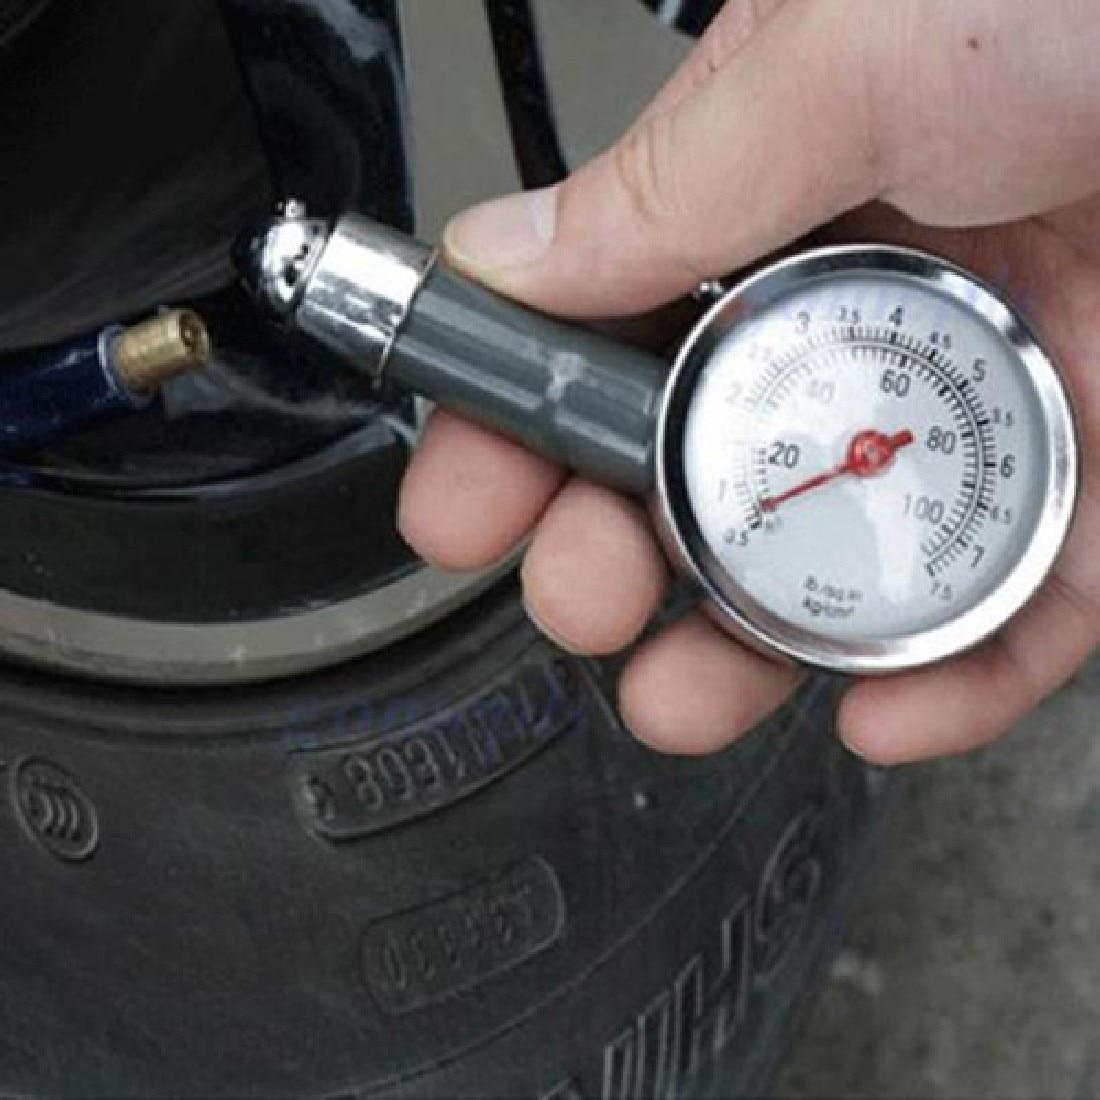 Black Hand Car Repair Test Metal Car Tire Pressure Gauge Auto Air Pressure Meter Tester Diagnostic Tool Second High Precision